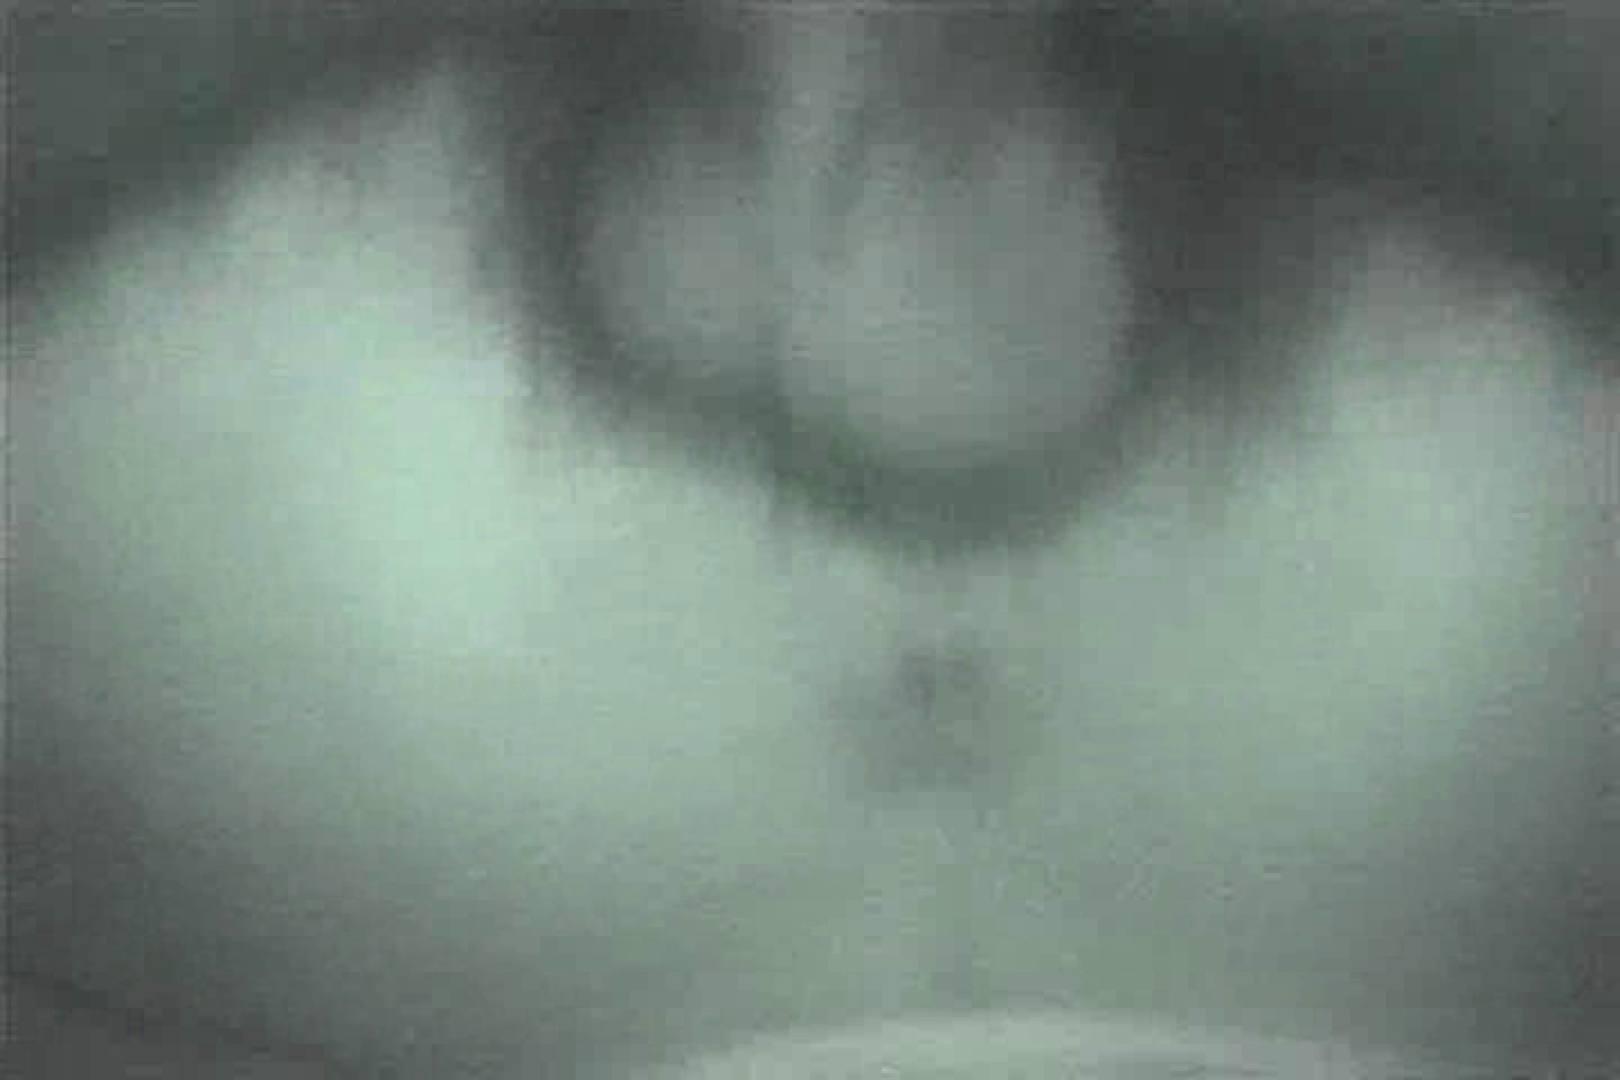 MASAさんの待ち伏せ撮り! 赤外線カーセックスVol.19 セックス ヌード画像 69pic 13